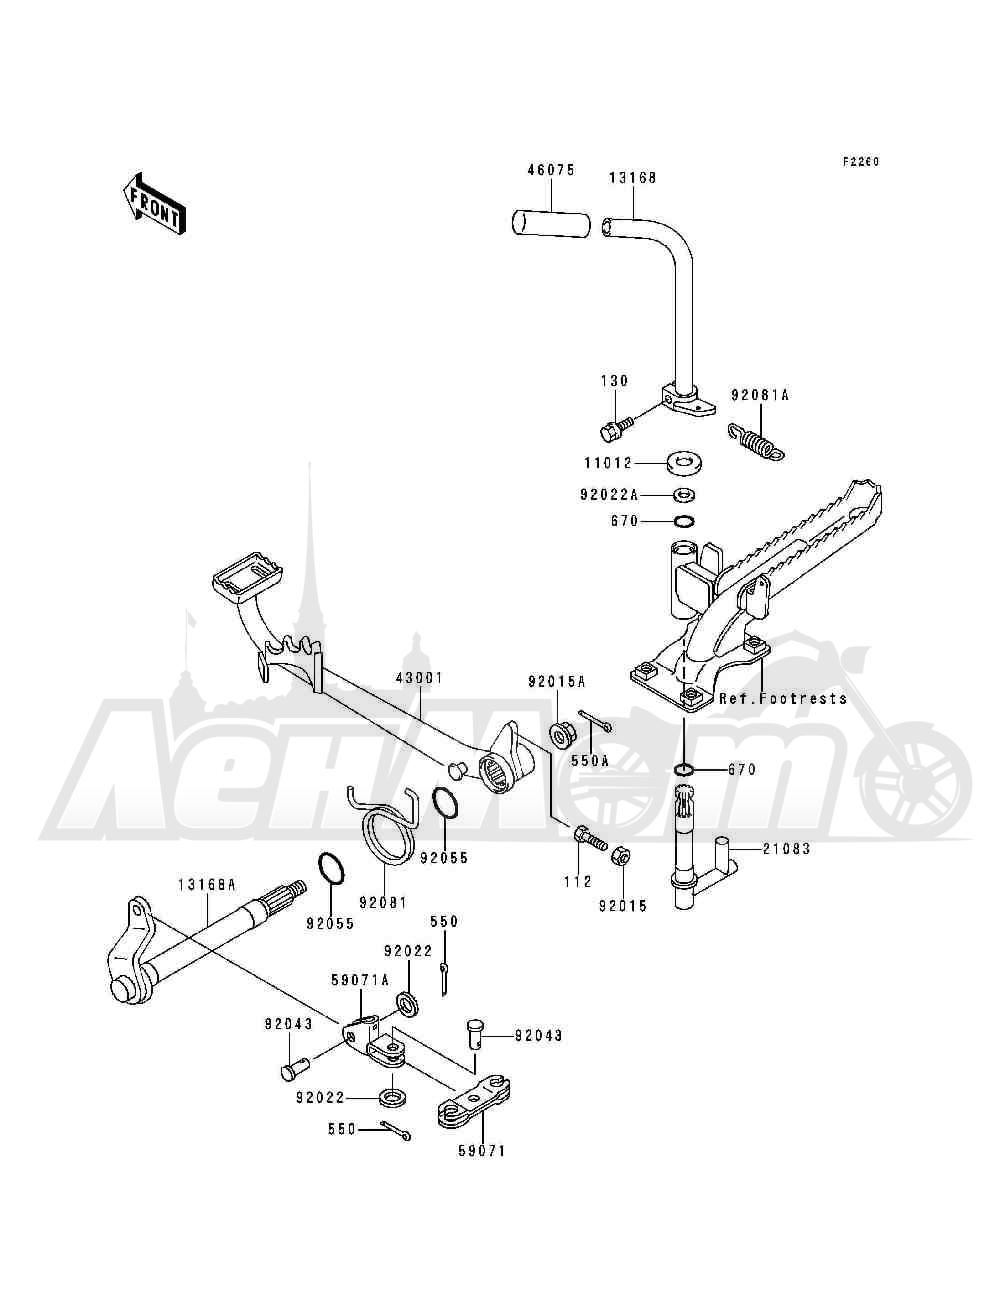 Запчасти для Квадроцикла Kawasaki 1993 BAYOU 300 (KLF300-B6) Раздел: BRAKE PEDAL   педаль тормоза